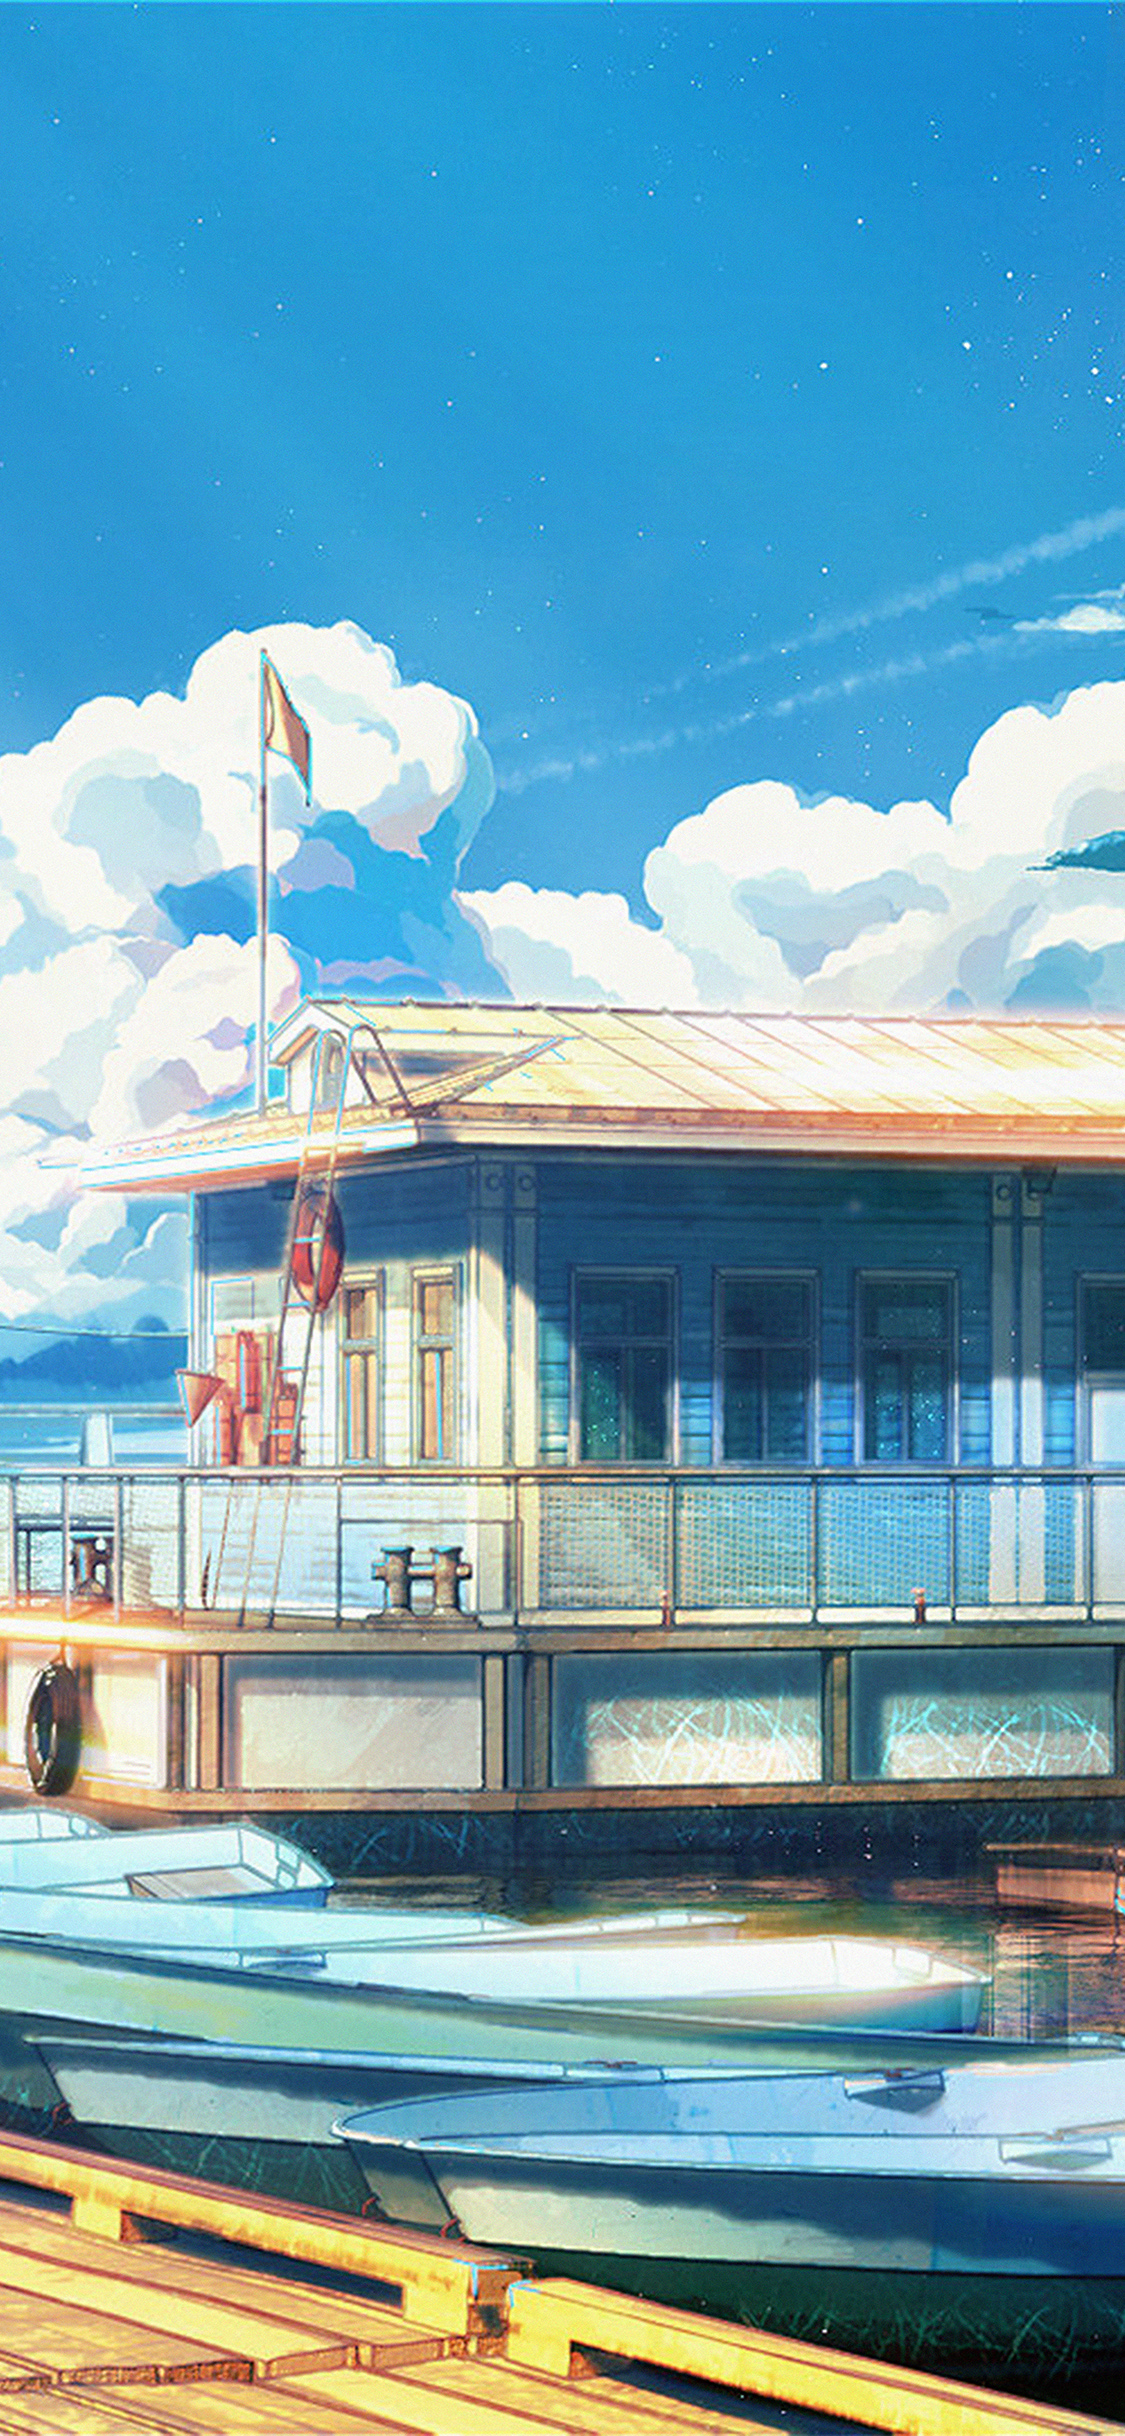 iPhoneXpapers.com-Apple-iPhone-wallpaper-av67-sea-illustration-art-anime-painting-arseniy-chebynkin